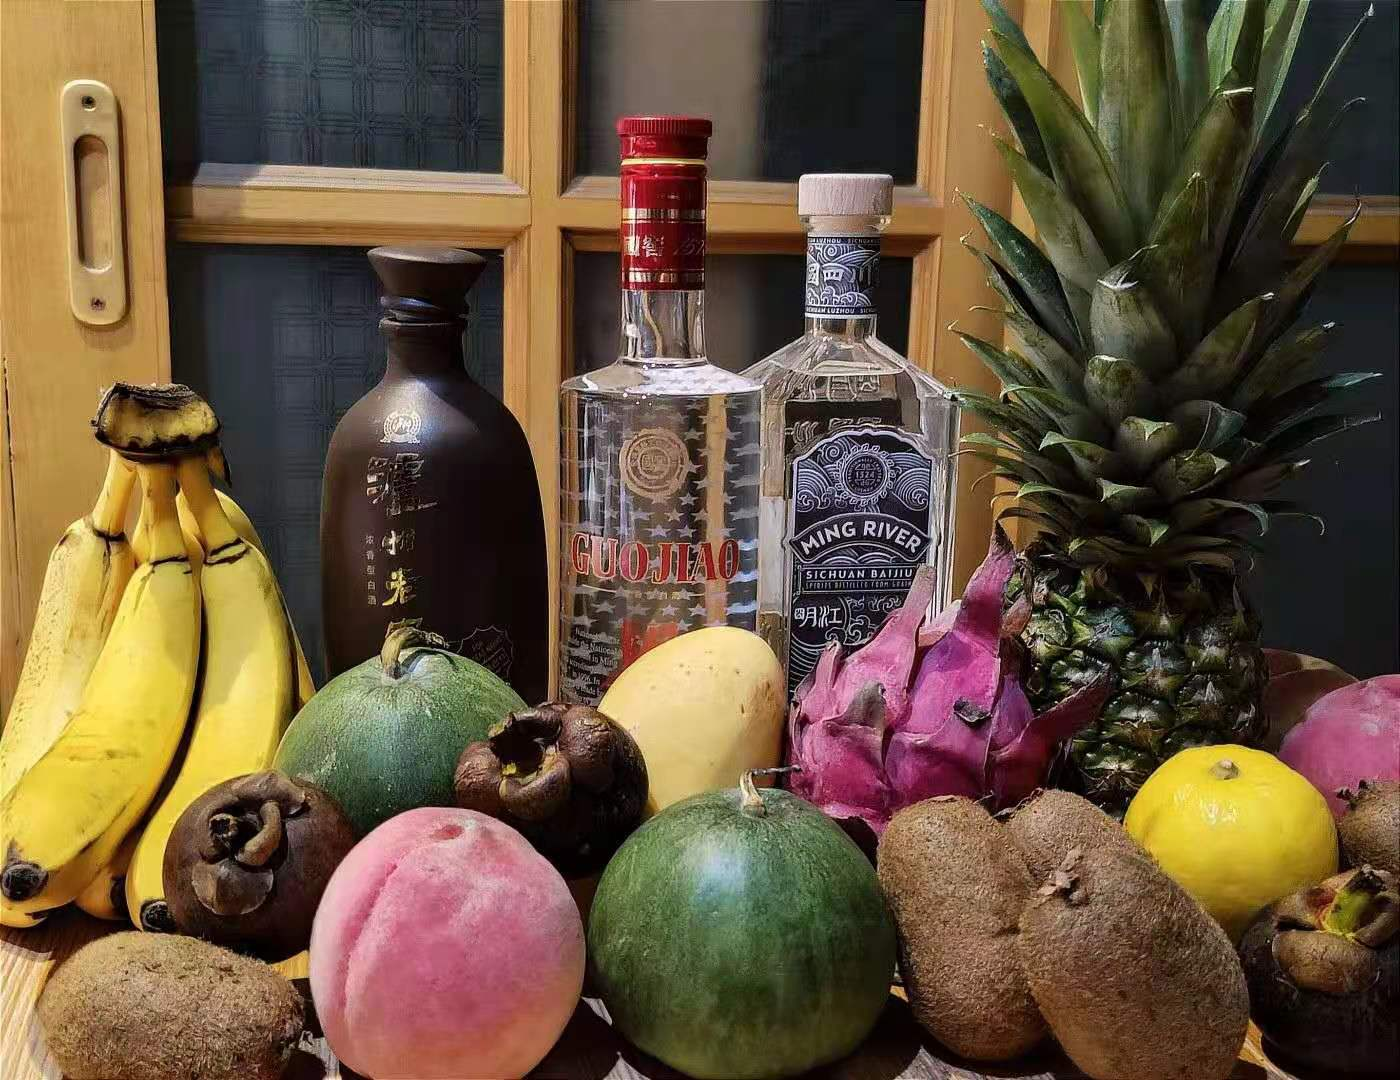 world-baijiu-day-2021-taste-test-fruit